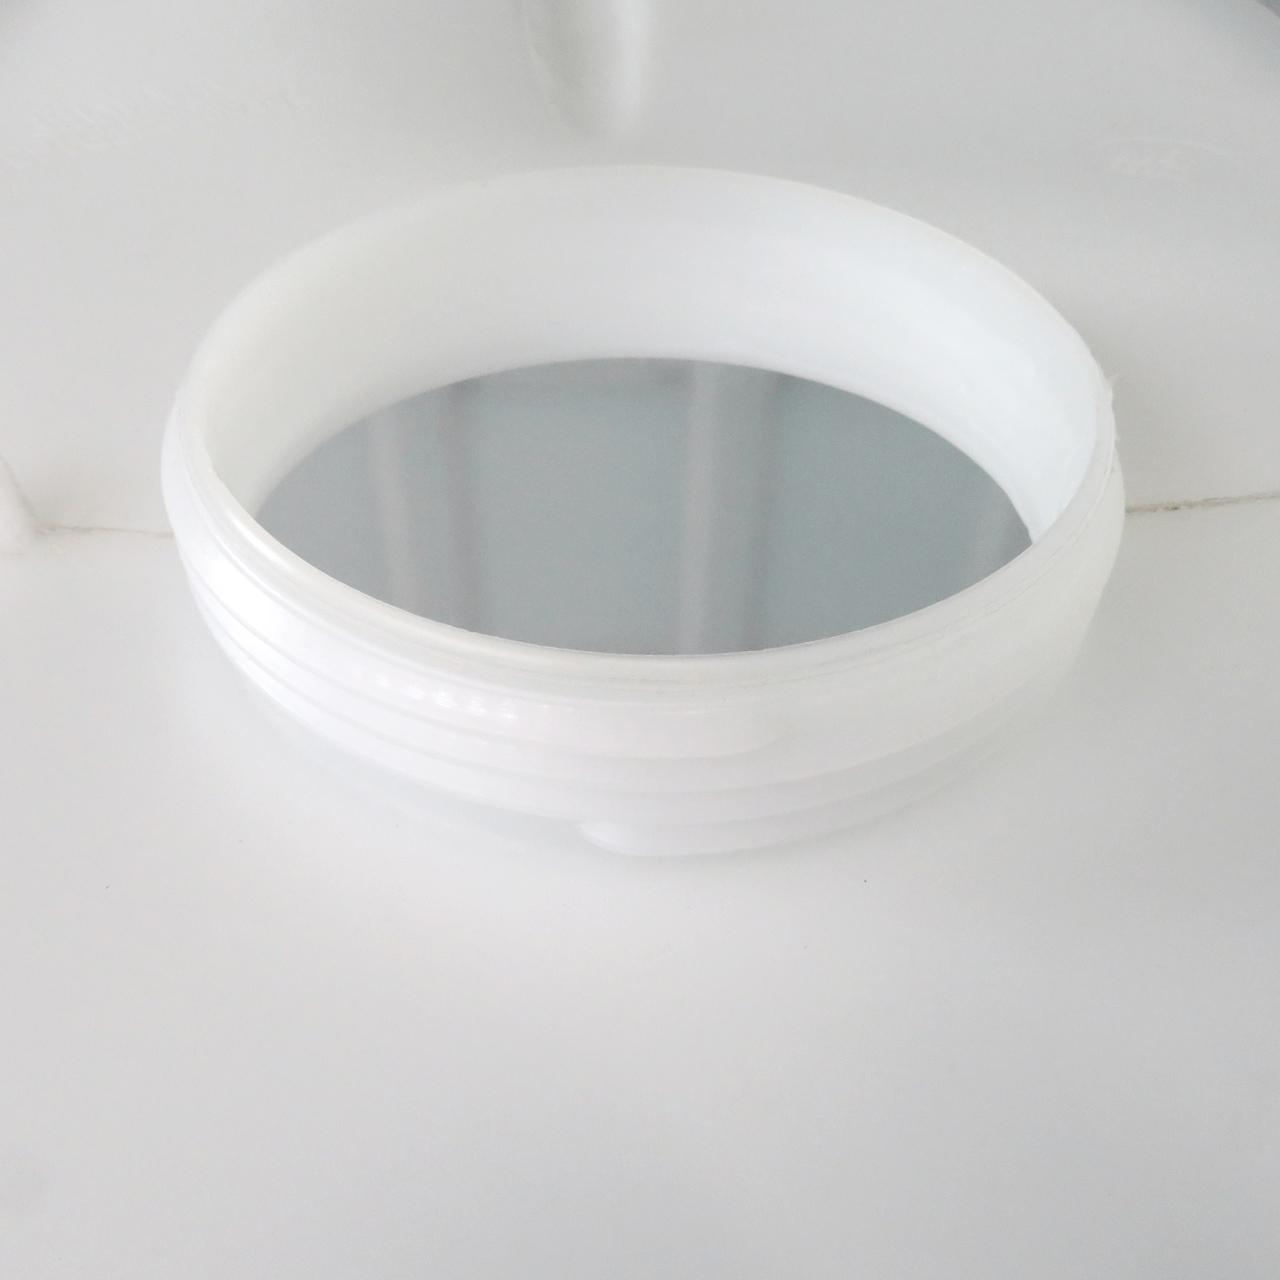 1000 L IBC Container, Kunststoff-Palette, 150/50, FDA, UN Zulassung